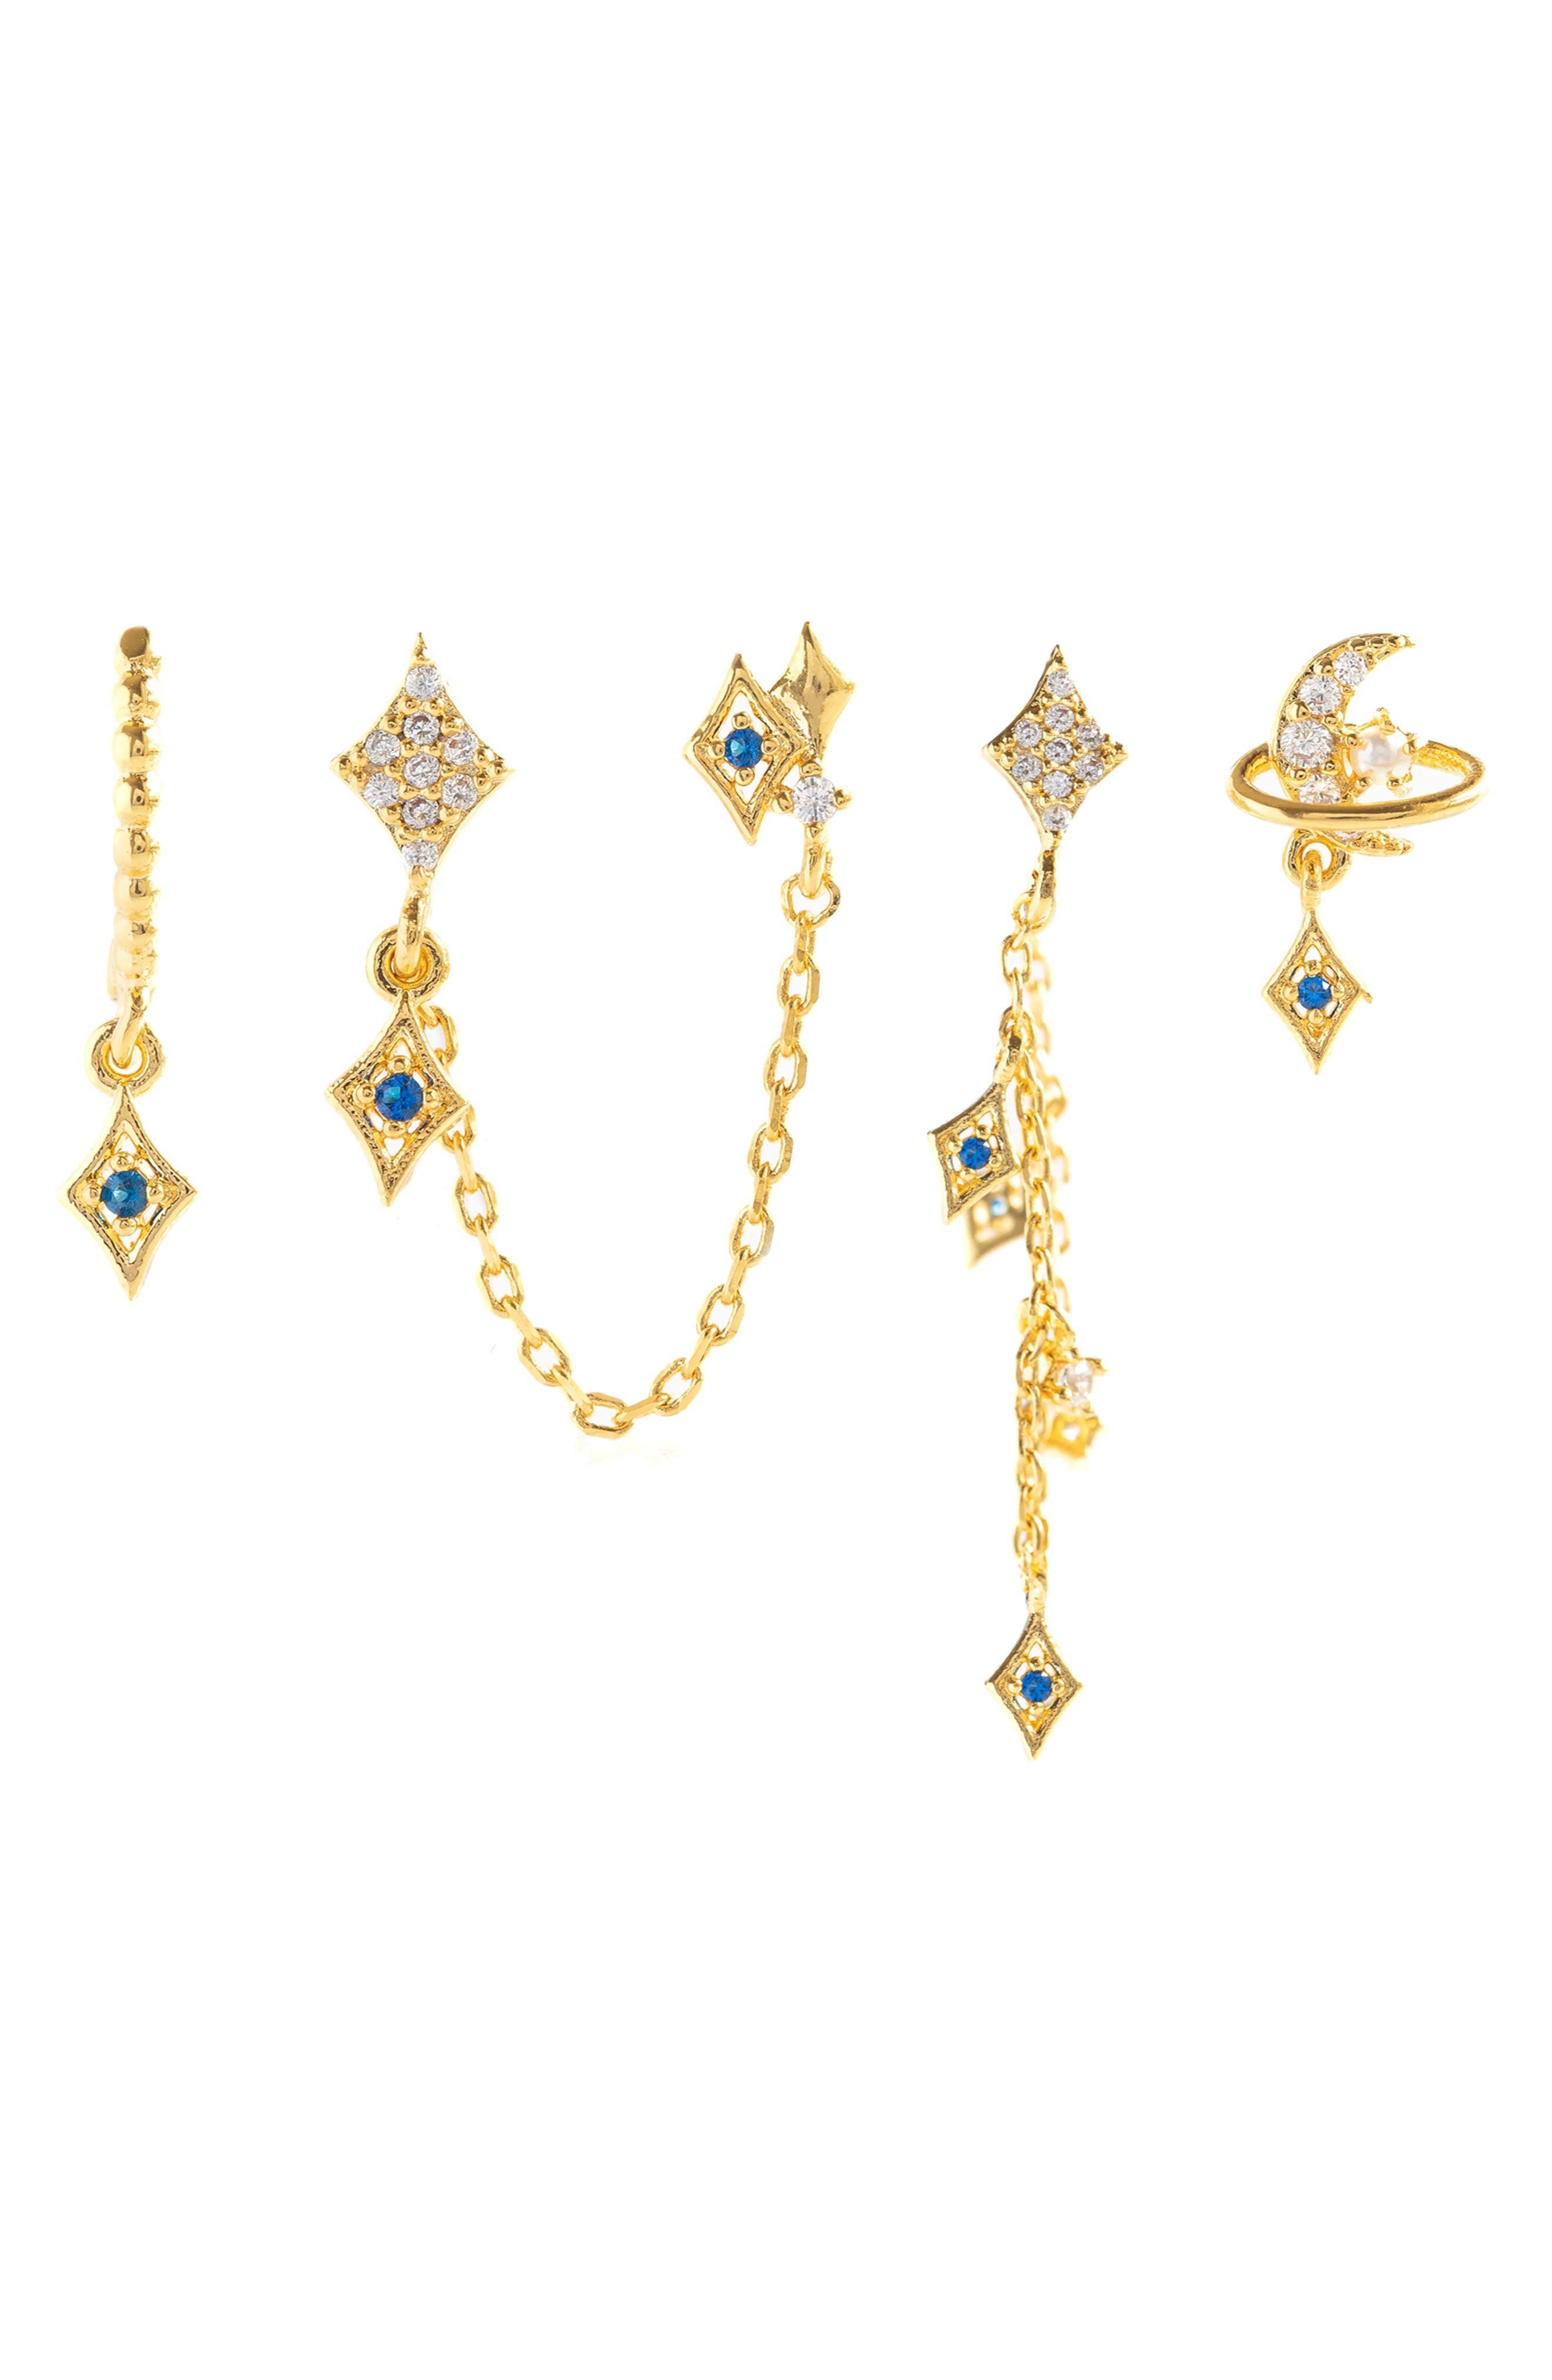 Stellar Set Of 4 Mismatched Earrings